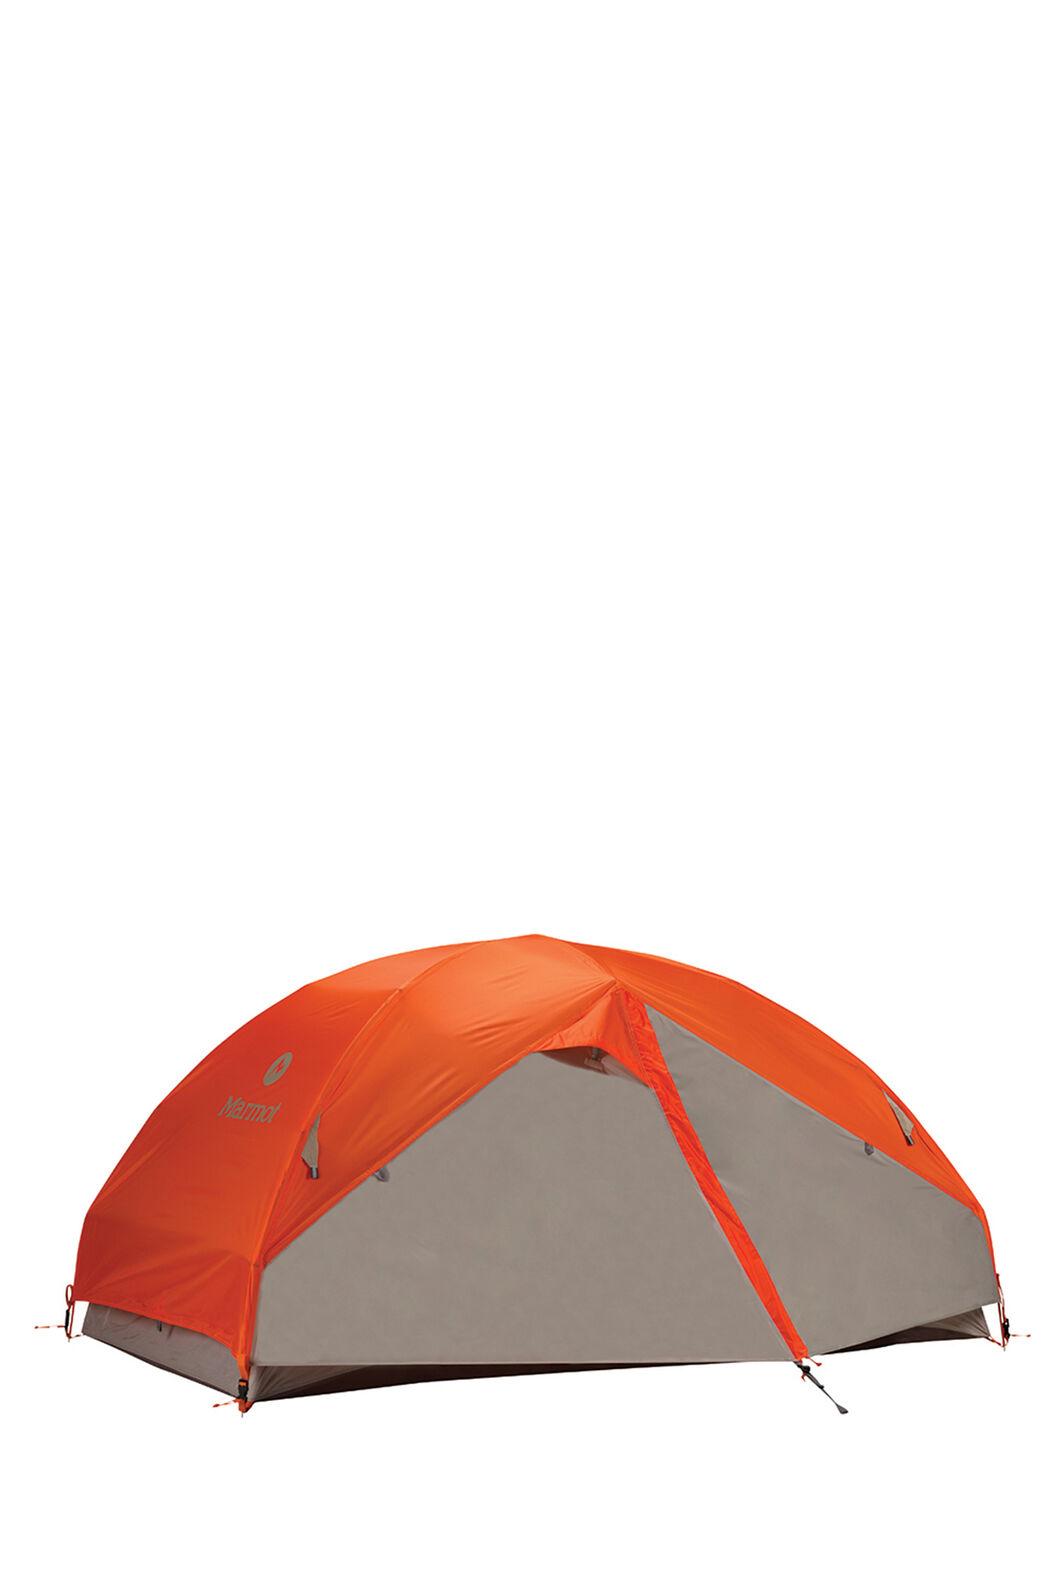 Marmot Tungsten 2 Person Hiking Tent, None, hi-res